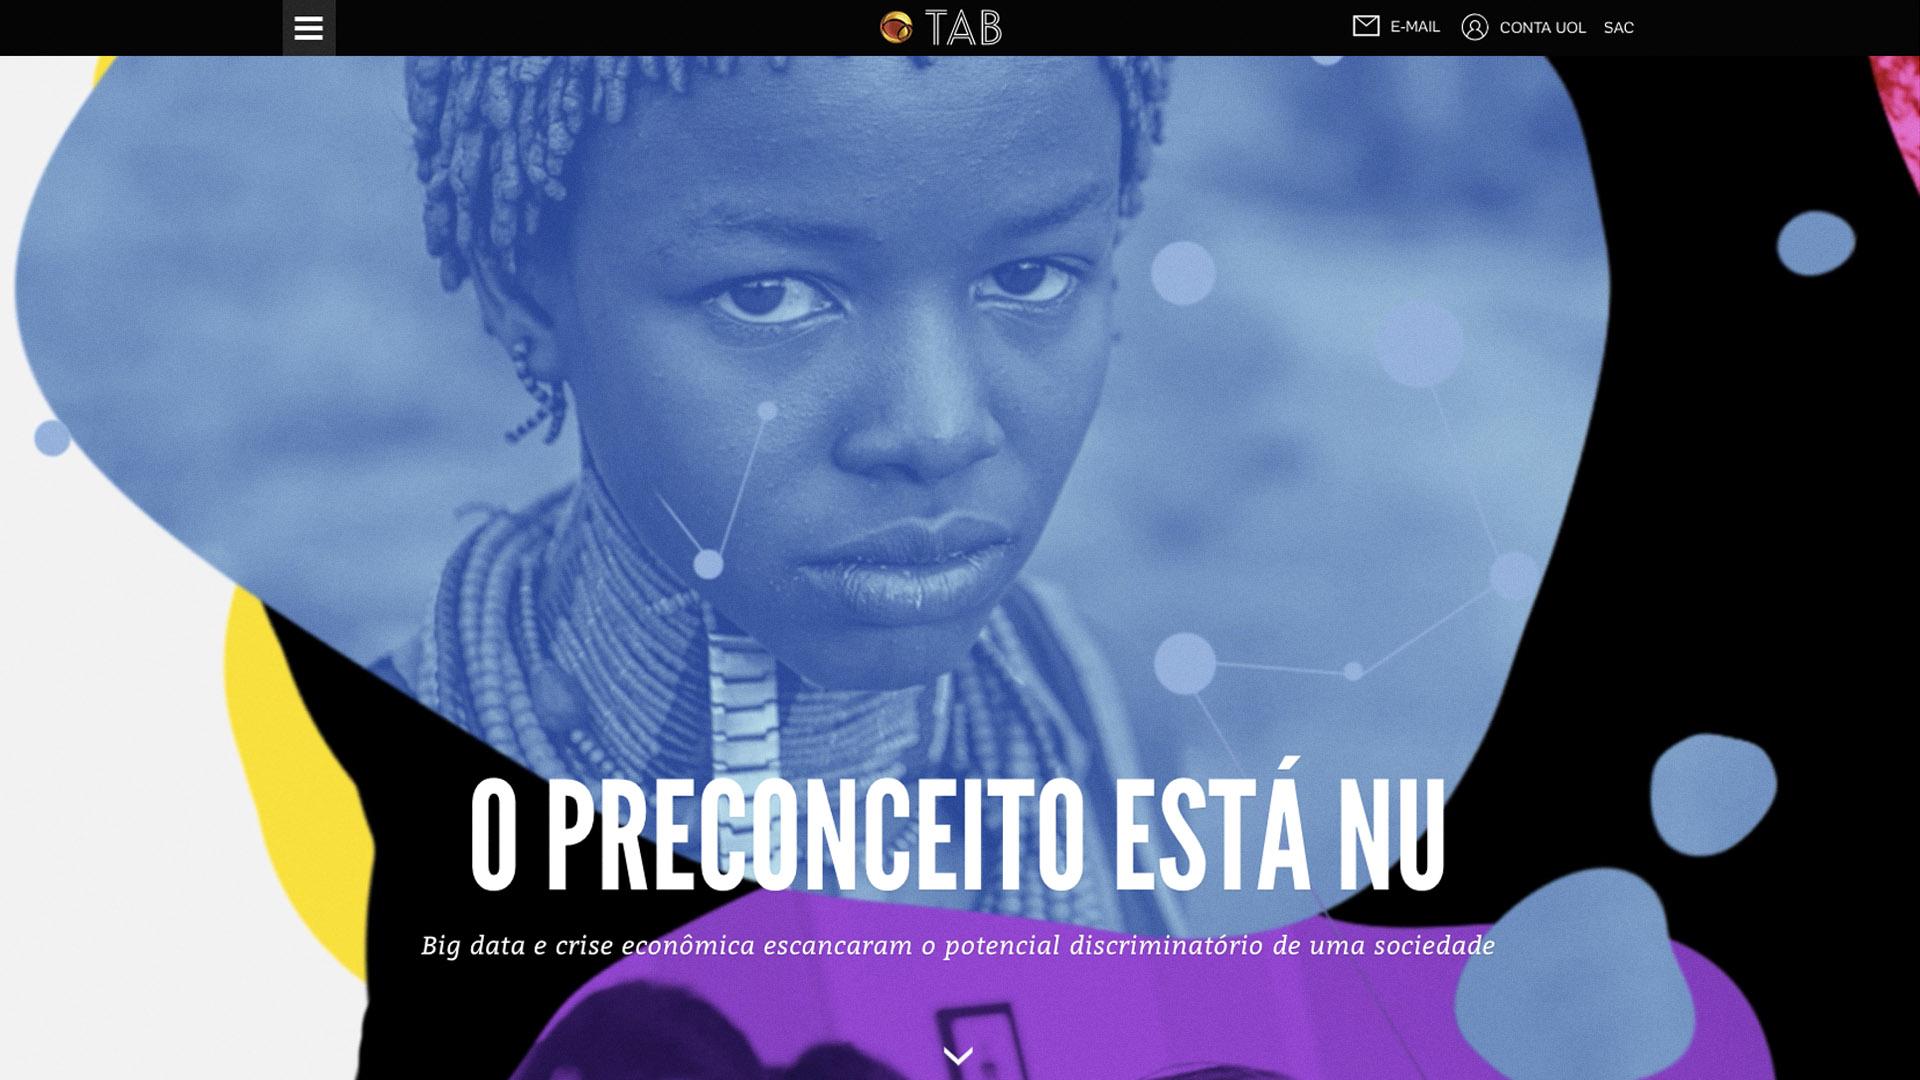 The project helped to raise the debate about how algorithmsand Big Data can also replicatea prejudice behavior. - tab.uol.com.br/preconceito